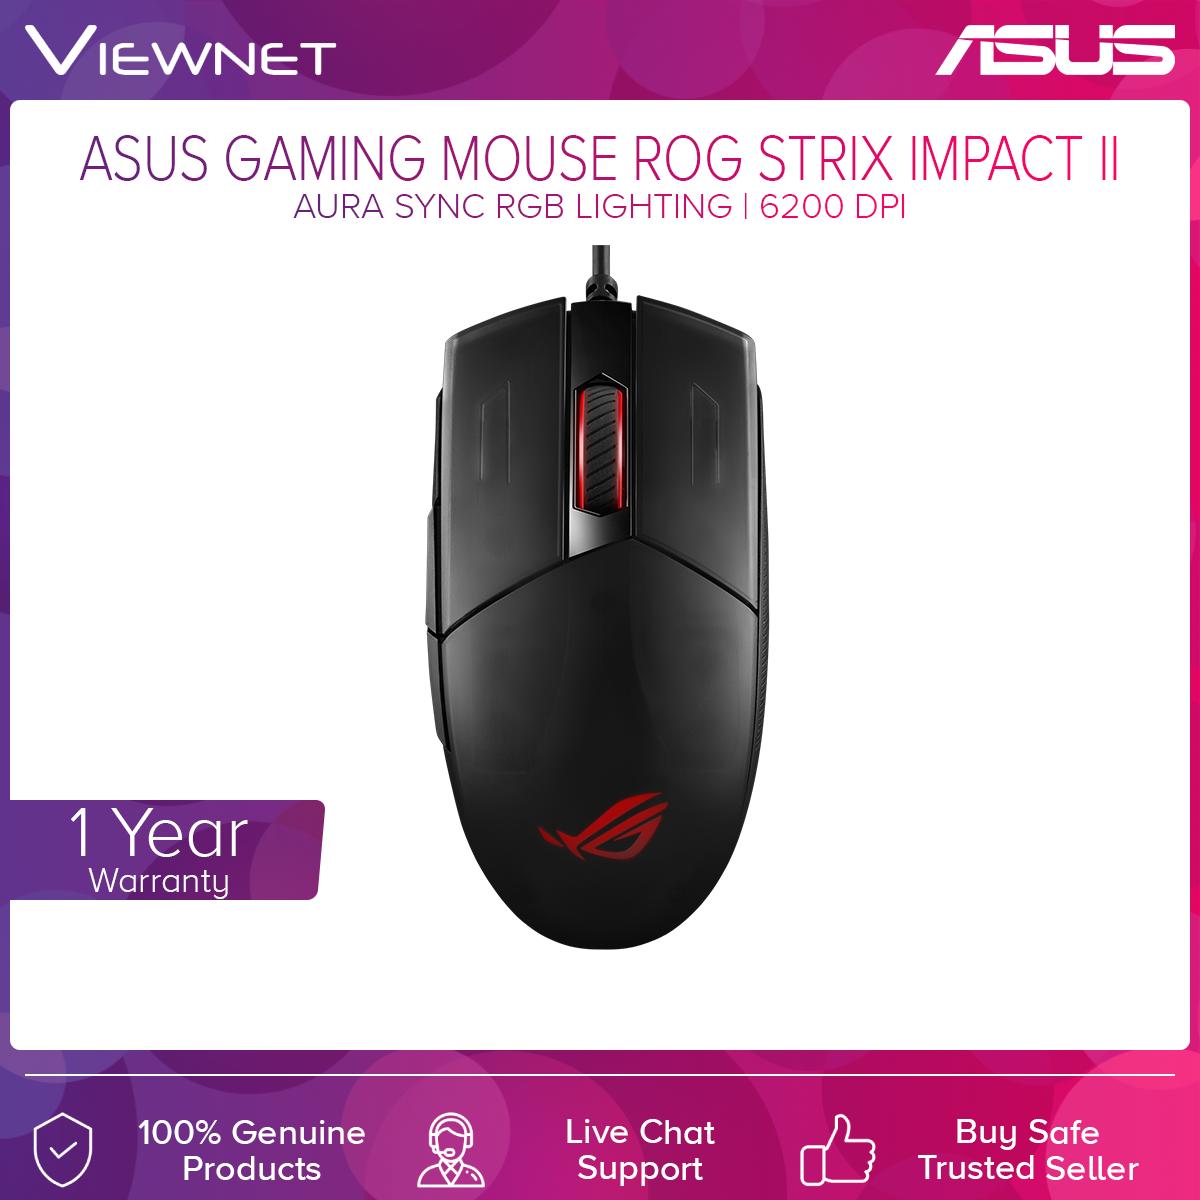 Asus ROG Strix Impact II Gaming Mouse with Ambidextrous, Ergonomic Design, 6,200 DPI Optical Sensor, Lightweight Design and Aura Sync RGB Lighting